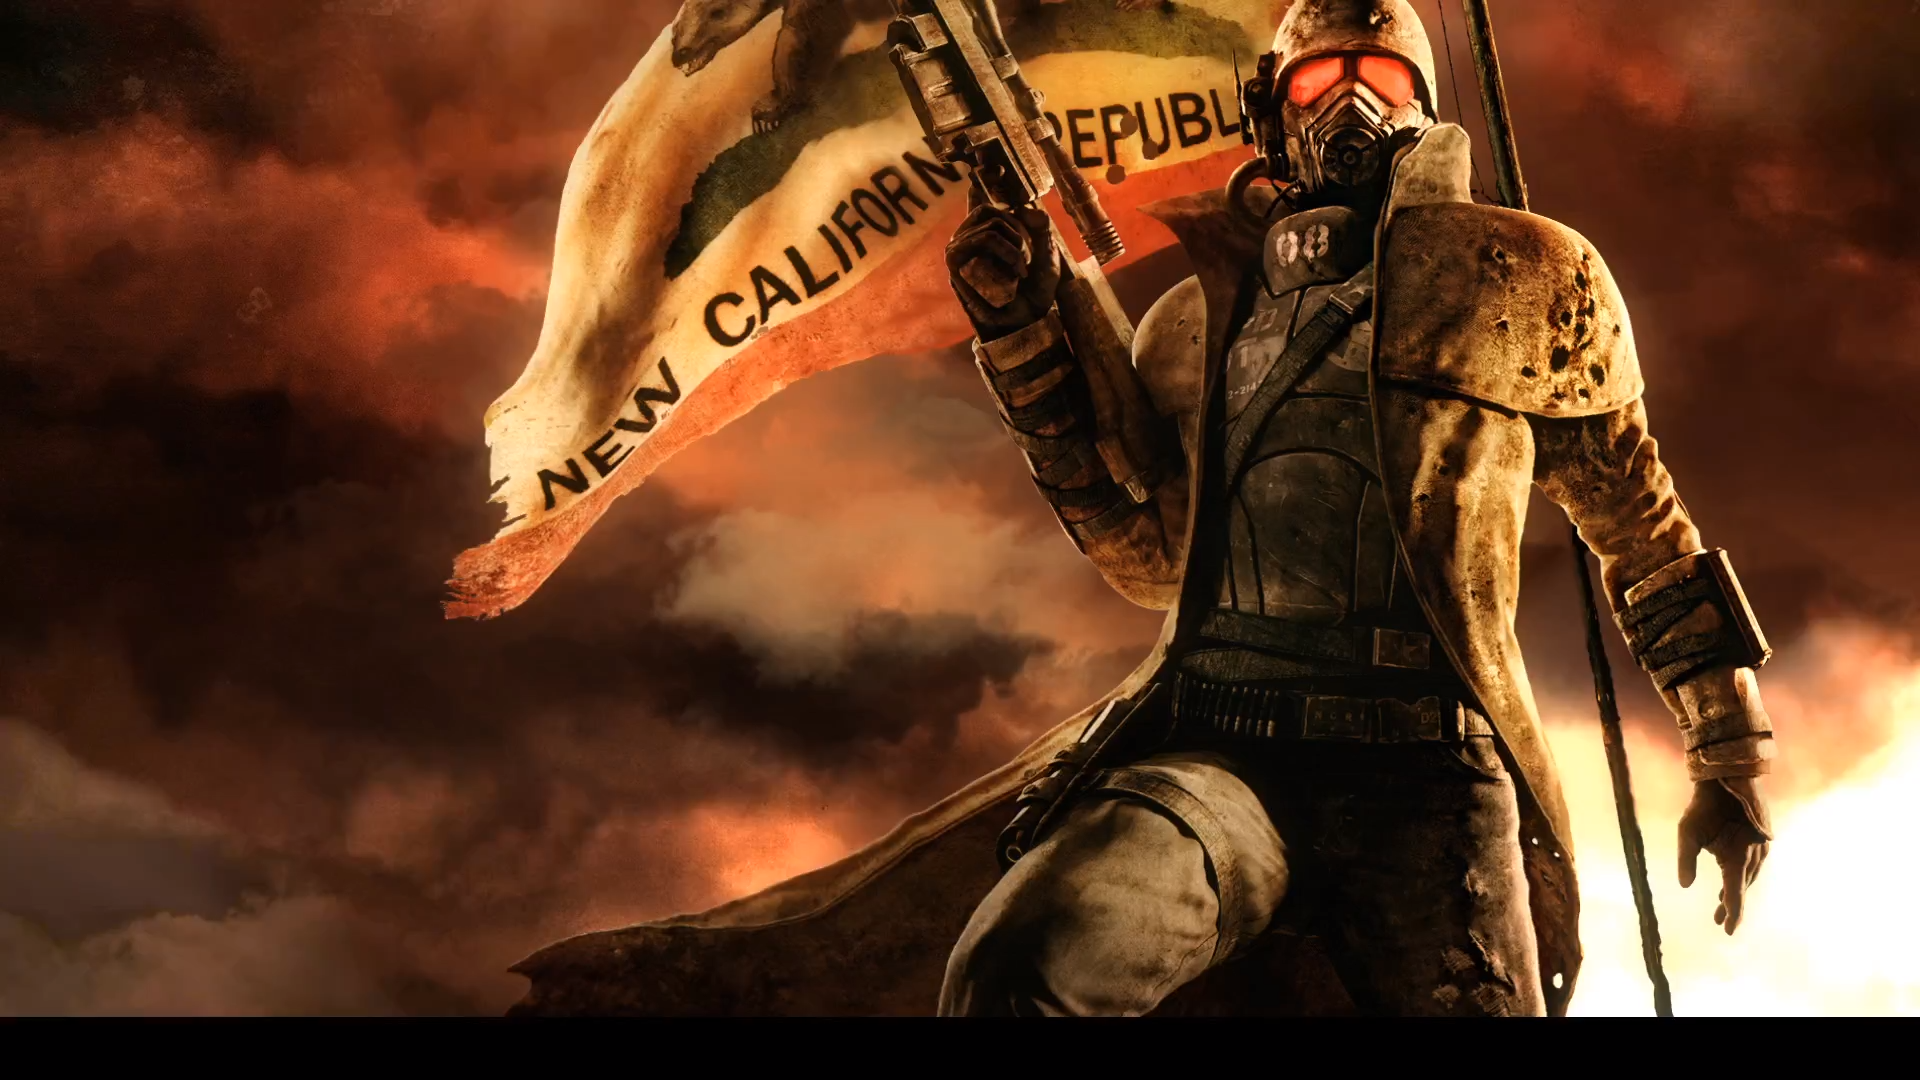 Fallout New Vegas Ncr Veteran Ranger Gaming Wallpaper Video Fallout Wallpaper Fallout 4 Wallpapers Fallout New Vegas